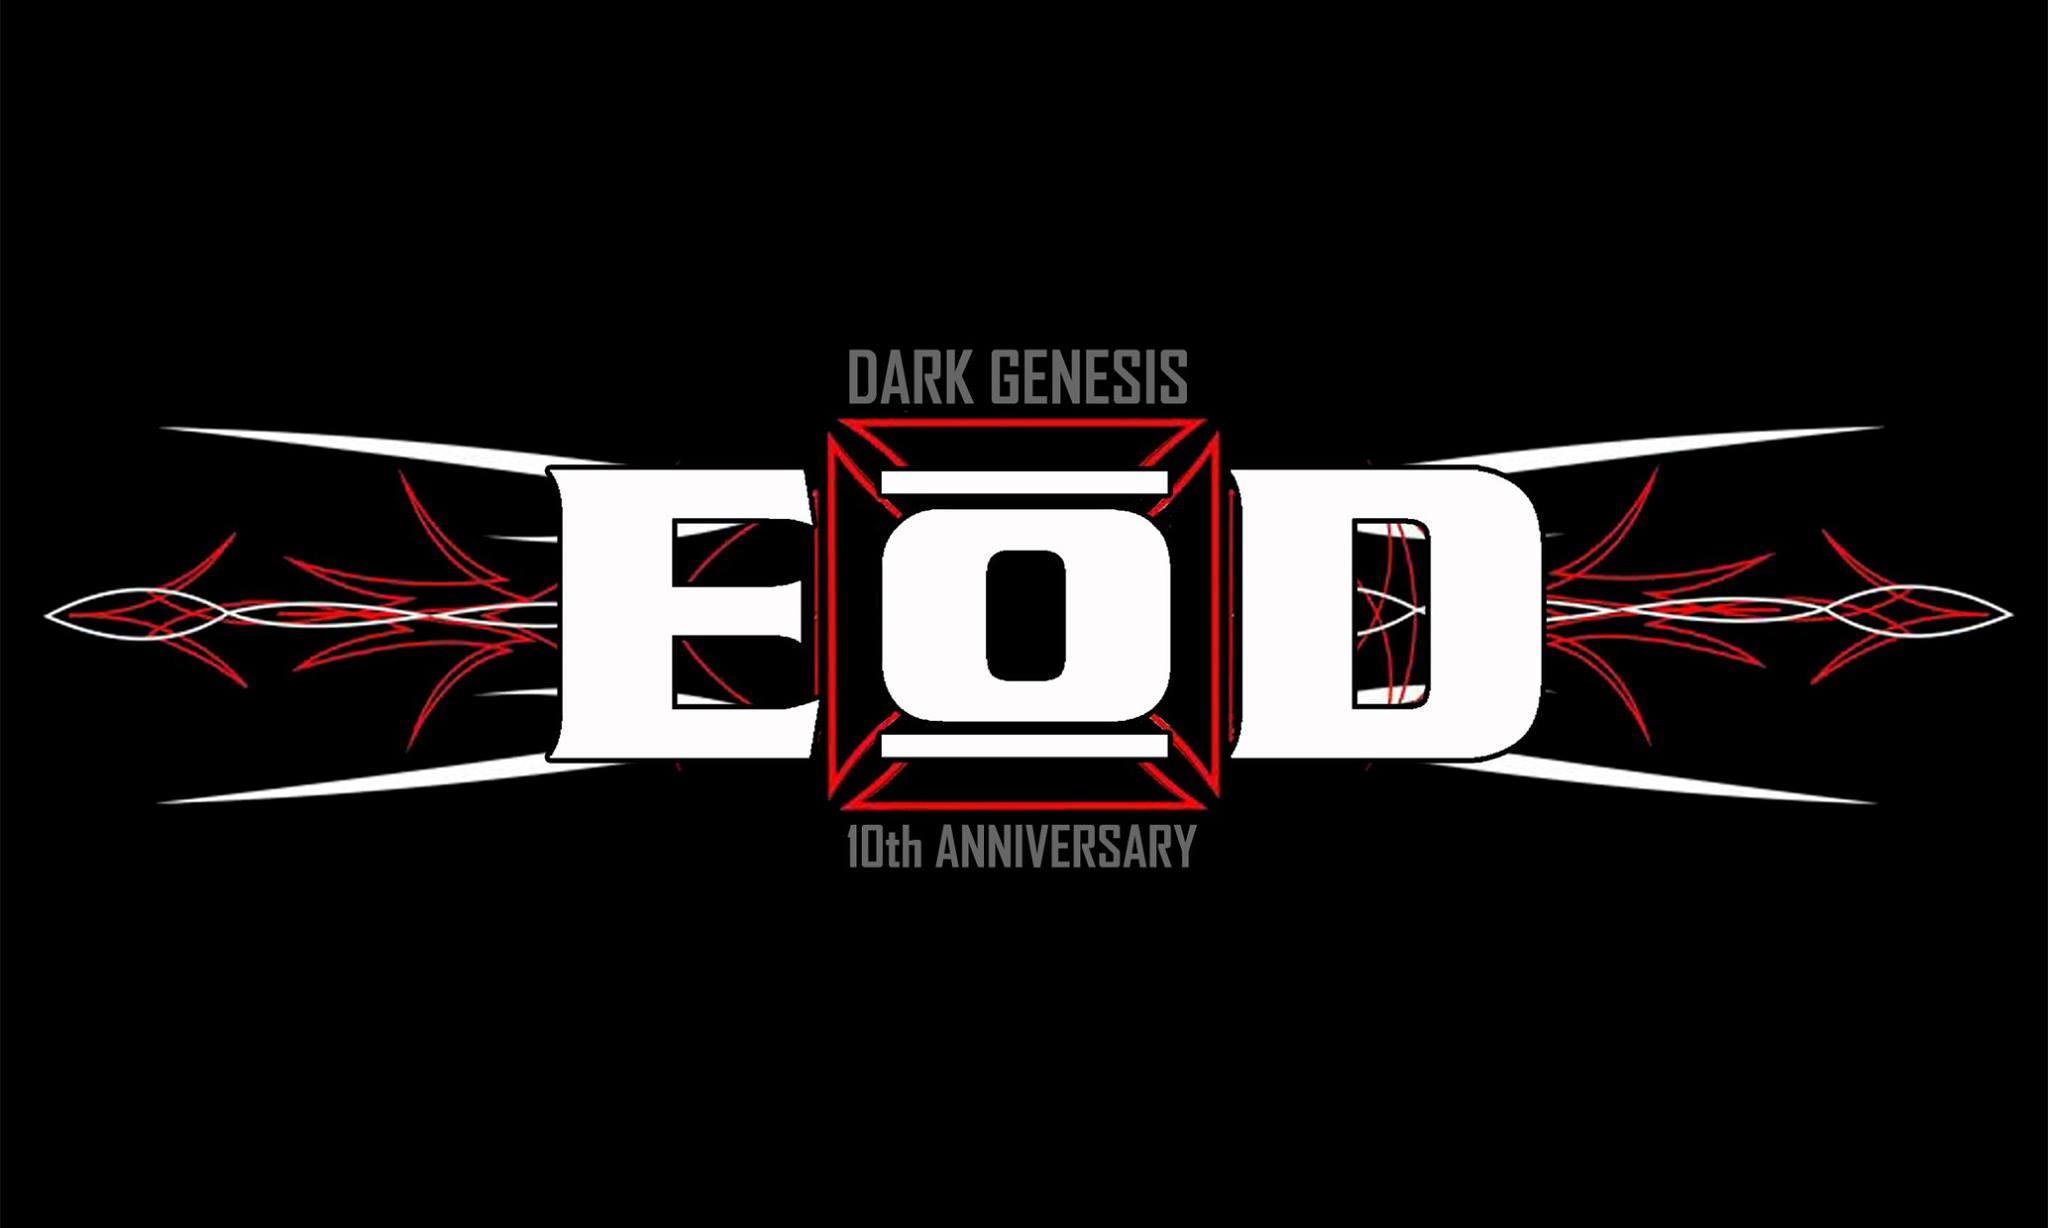 E:O:D Dark Genesis - Essigfabrik(22 juillet 2016)